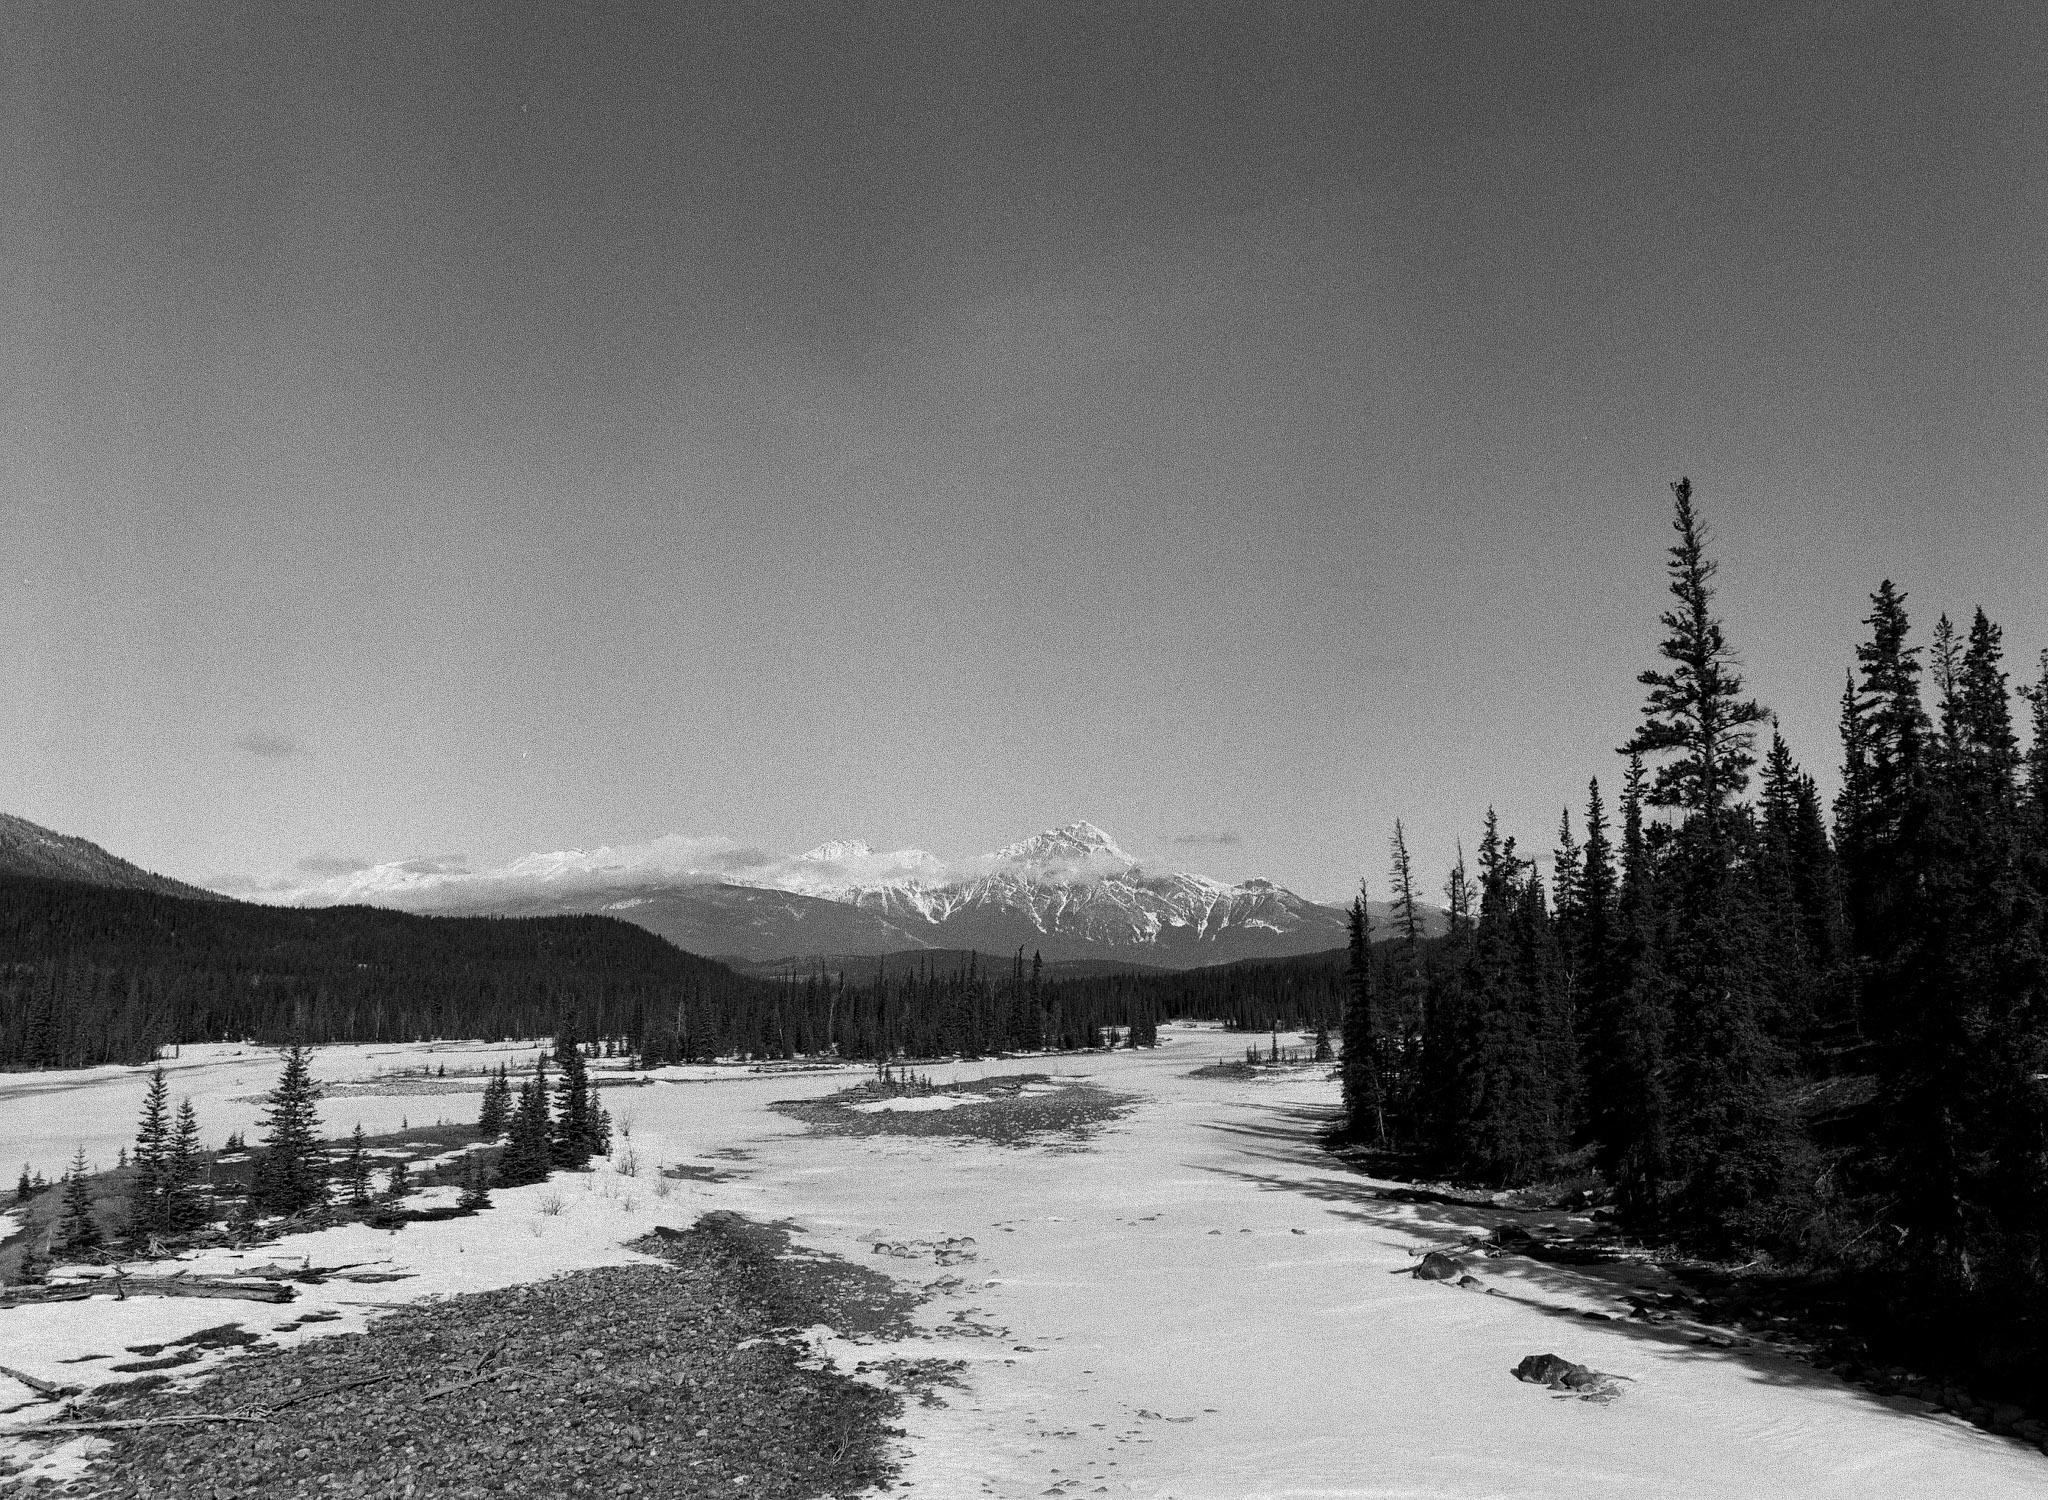 Pyramid Mountain, Jasper National Park. // TMAX400